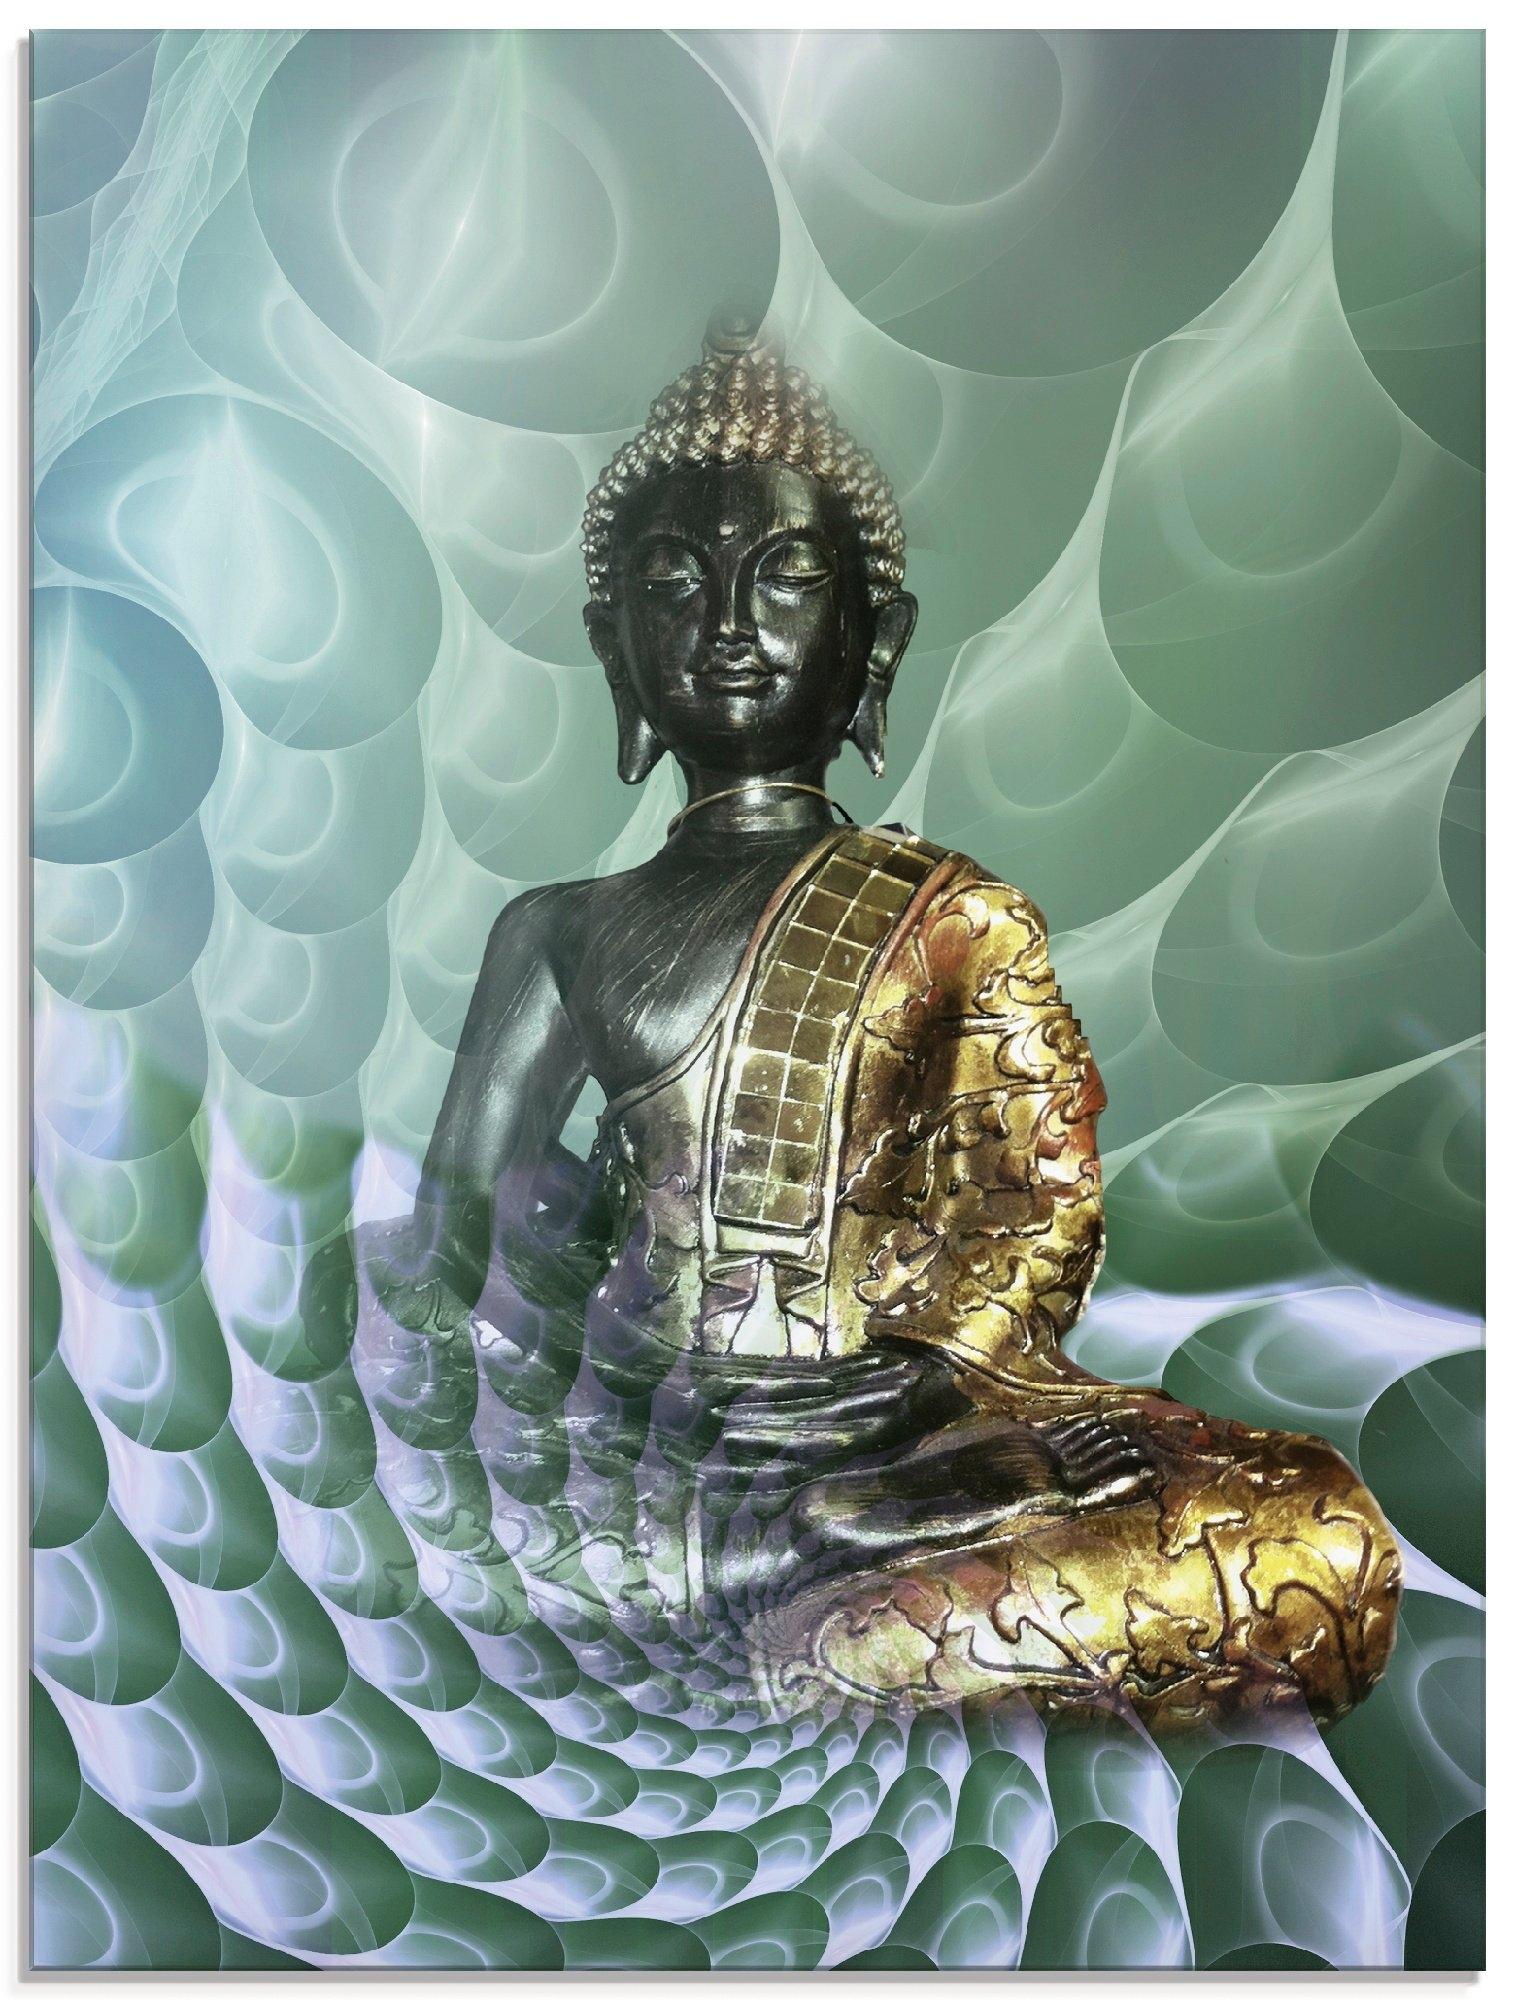 Artland print op glas Boeddha's droomwereld CB (1 stuk) goedkoop op otto.nl kopen